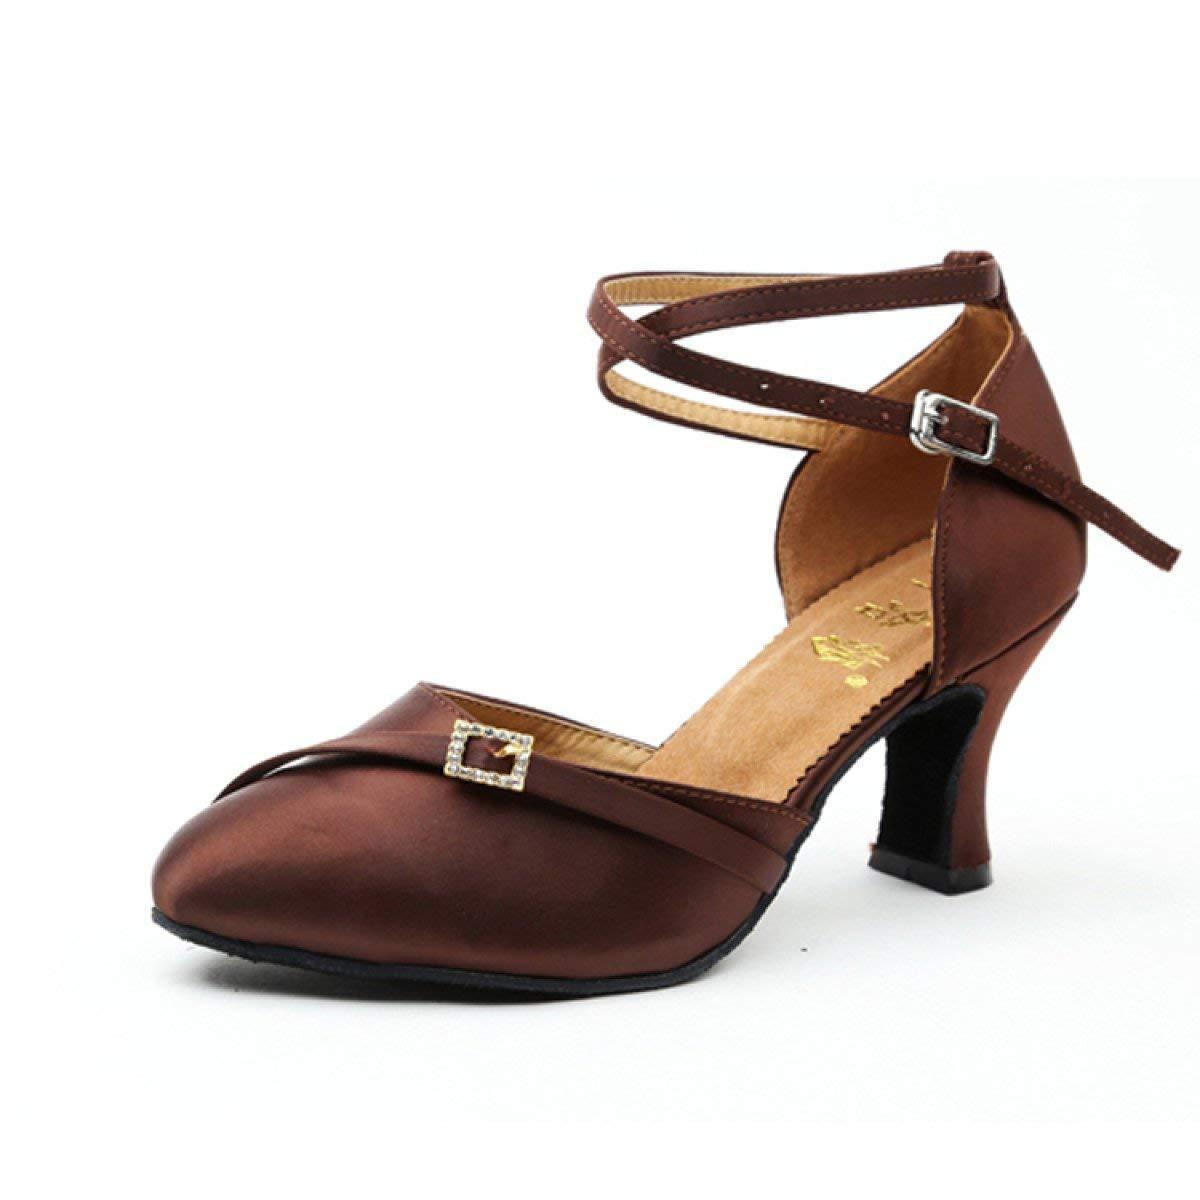 HhGold damen Latin Dance Closed Toe Hoher AbsatzSalsa Tango Chacha Samba Modern Jazz Schuhe Sandalen Orangeheeled6cm-UK4.5   EU36   Our37 (Farbe   braunheeled5cm Größe   UK4 EU35 Our36)